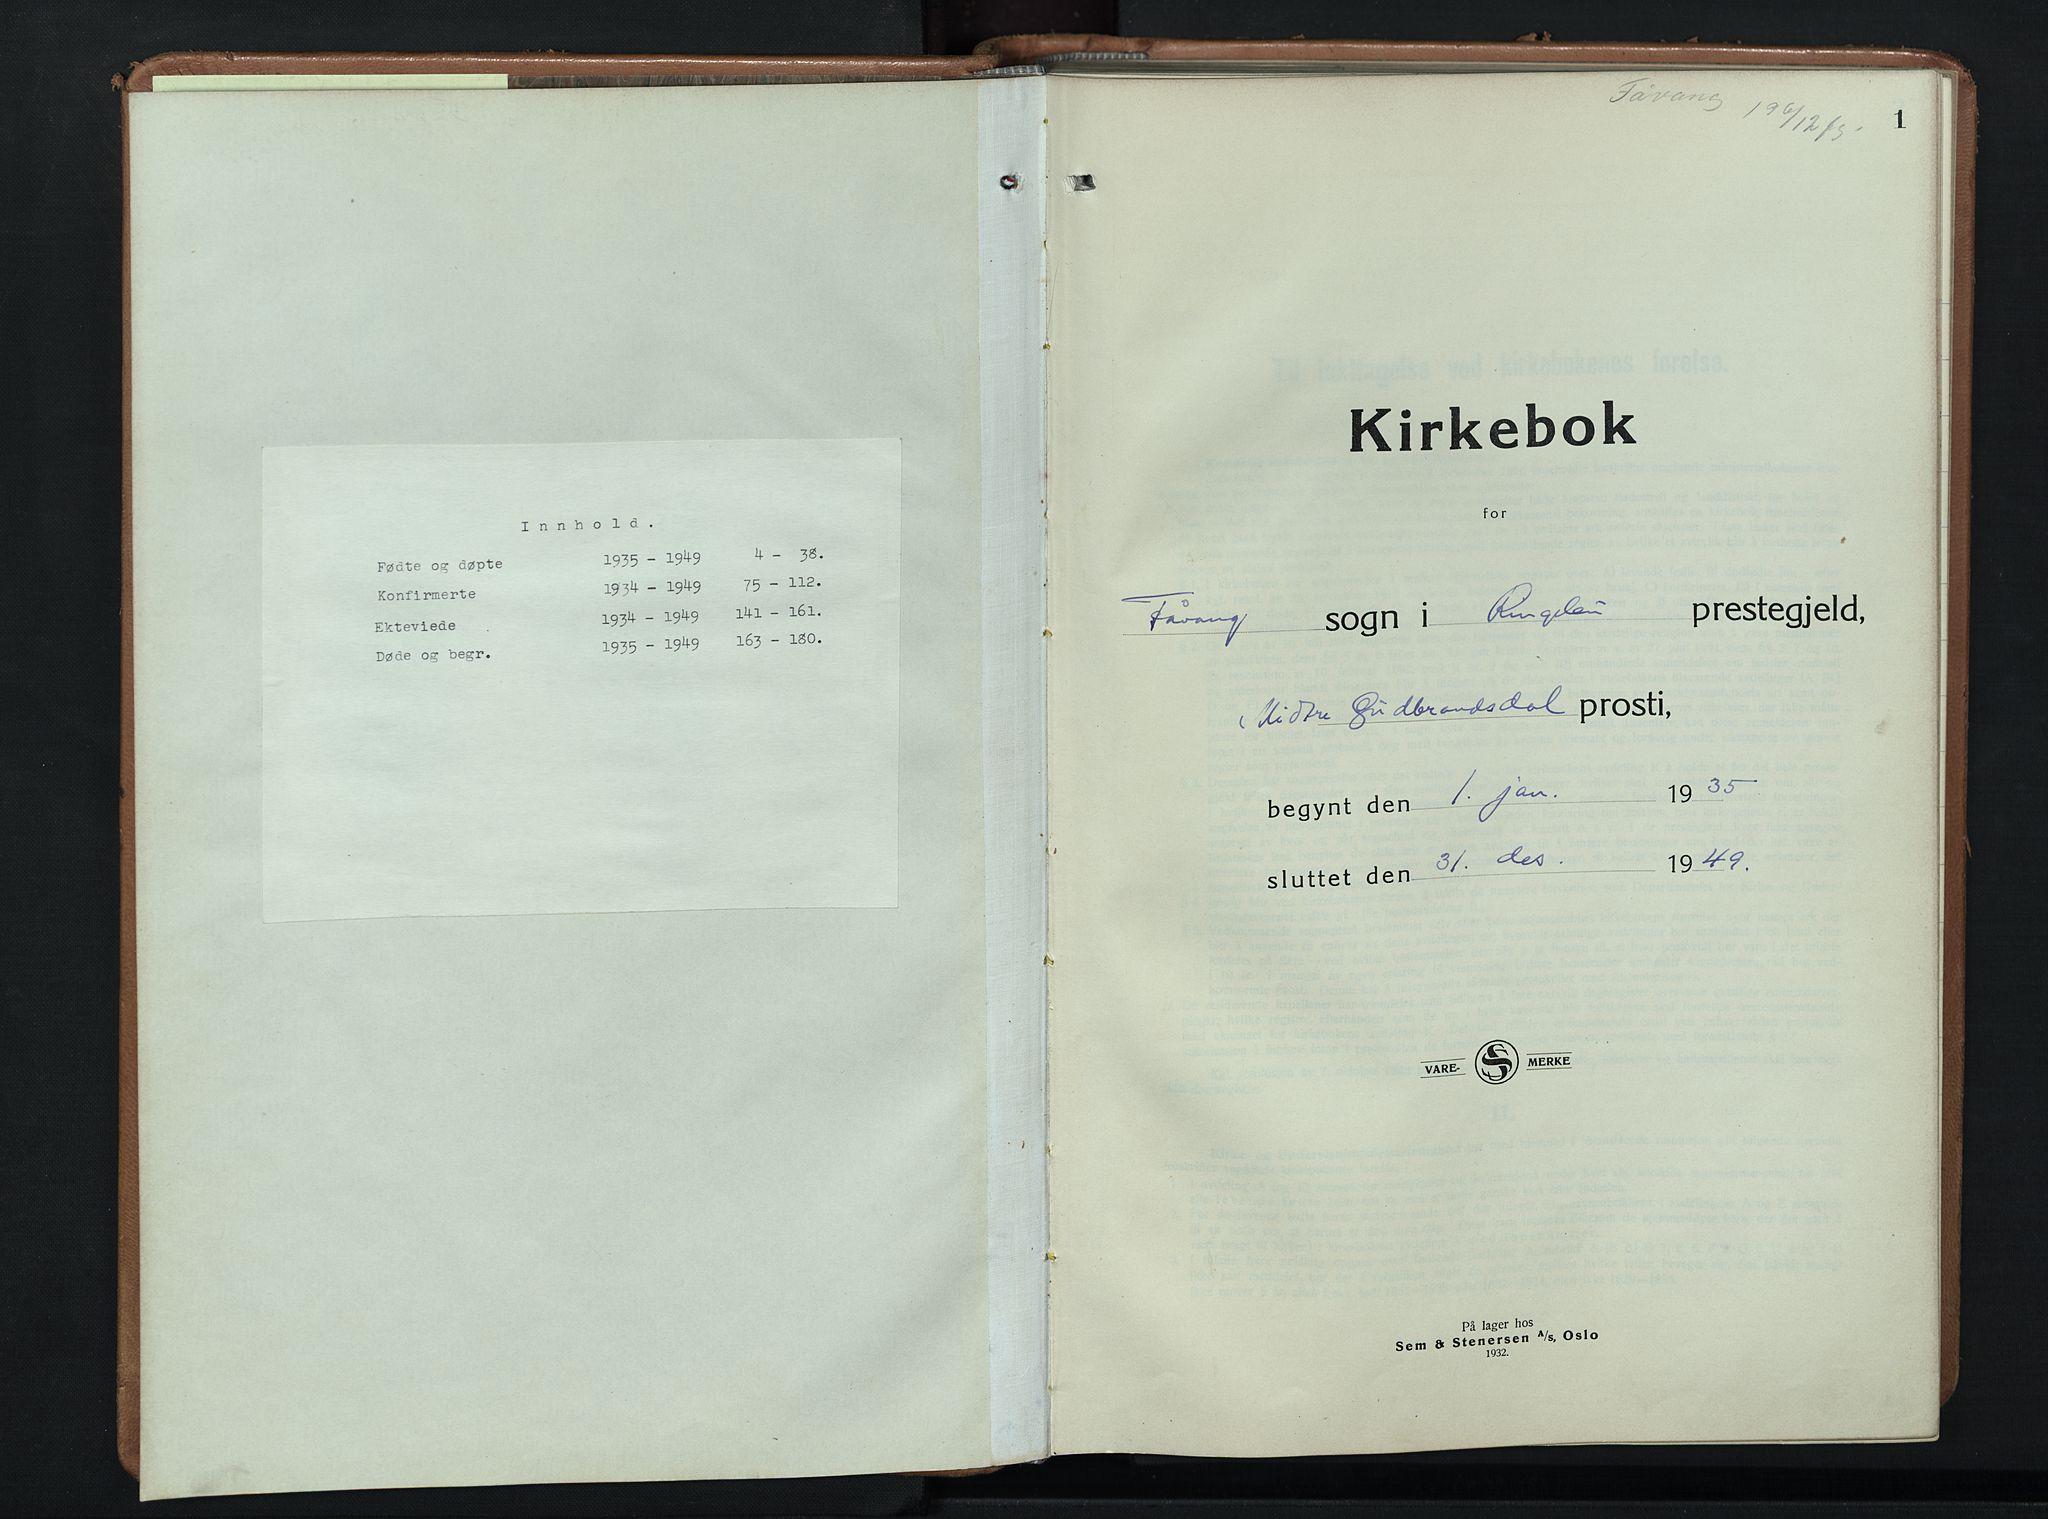 SAH, Ringebu prestekontor, Klokkerbok nr. 12, 1934-1949, s. 1